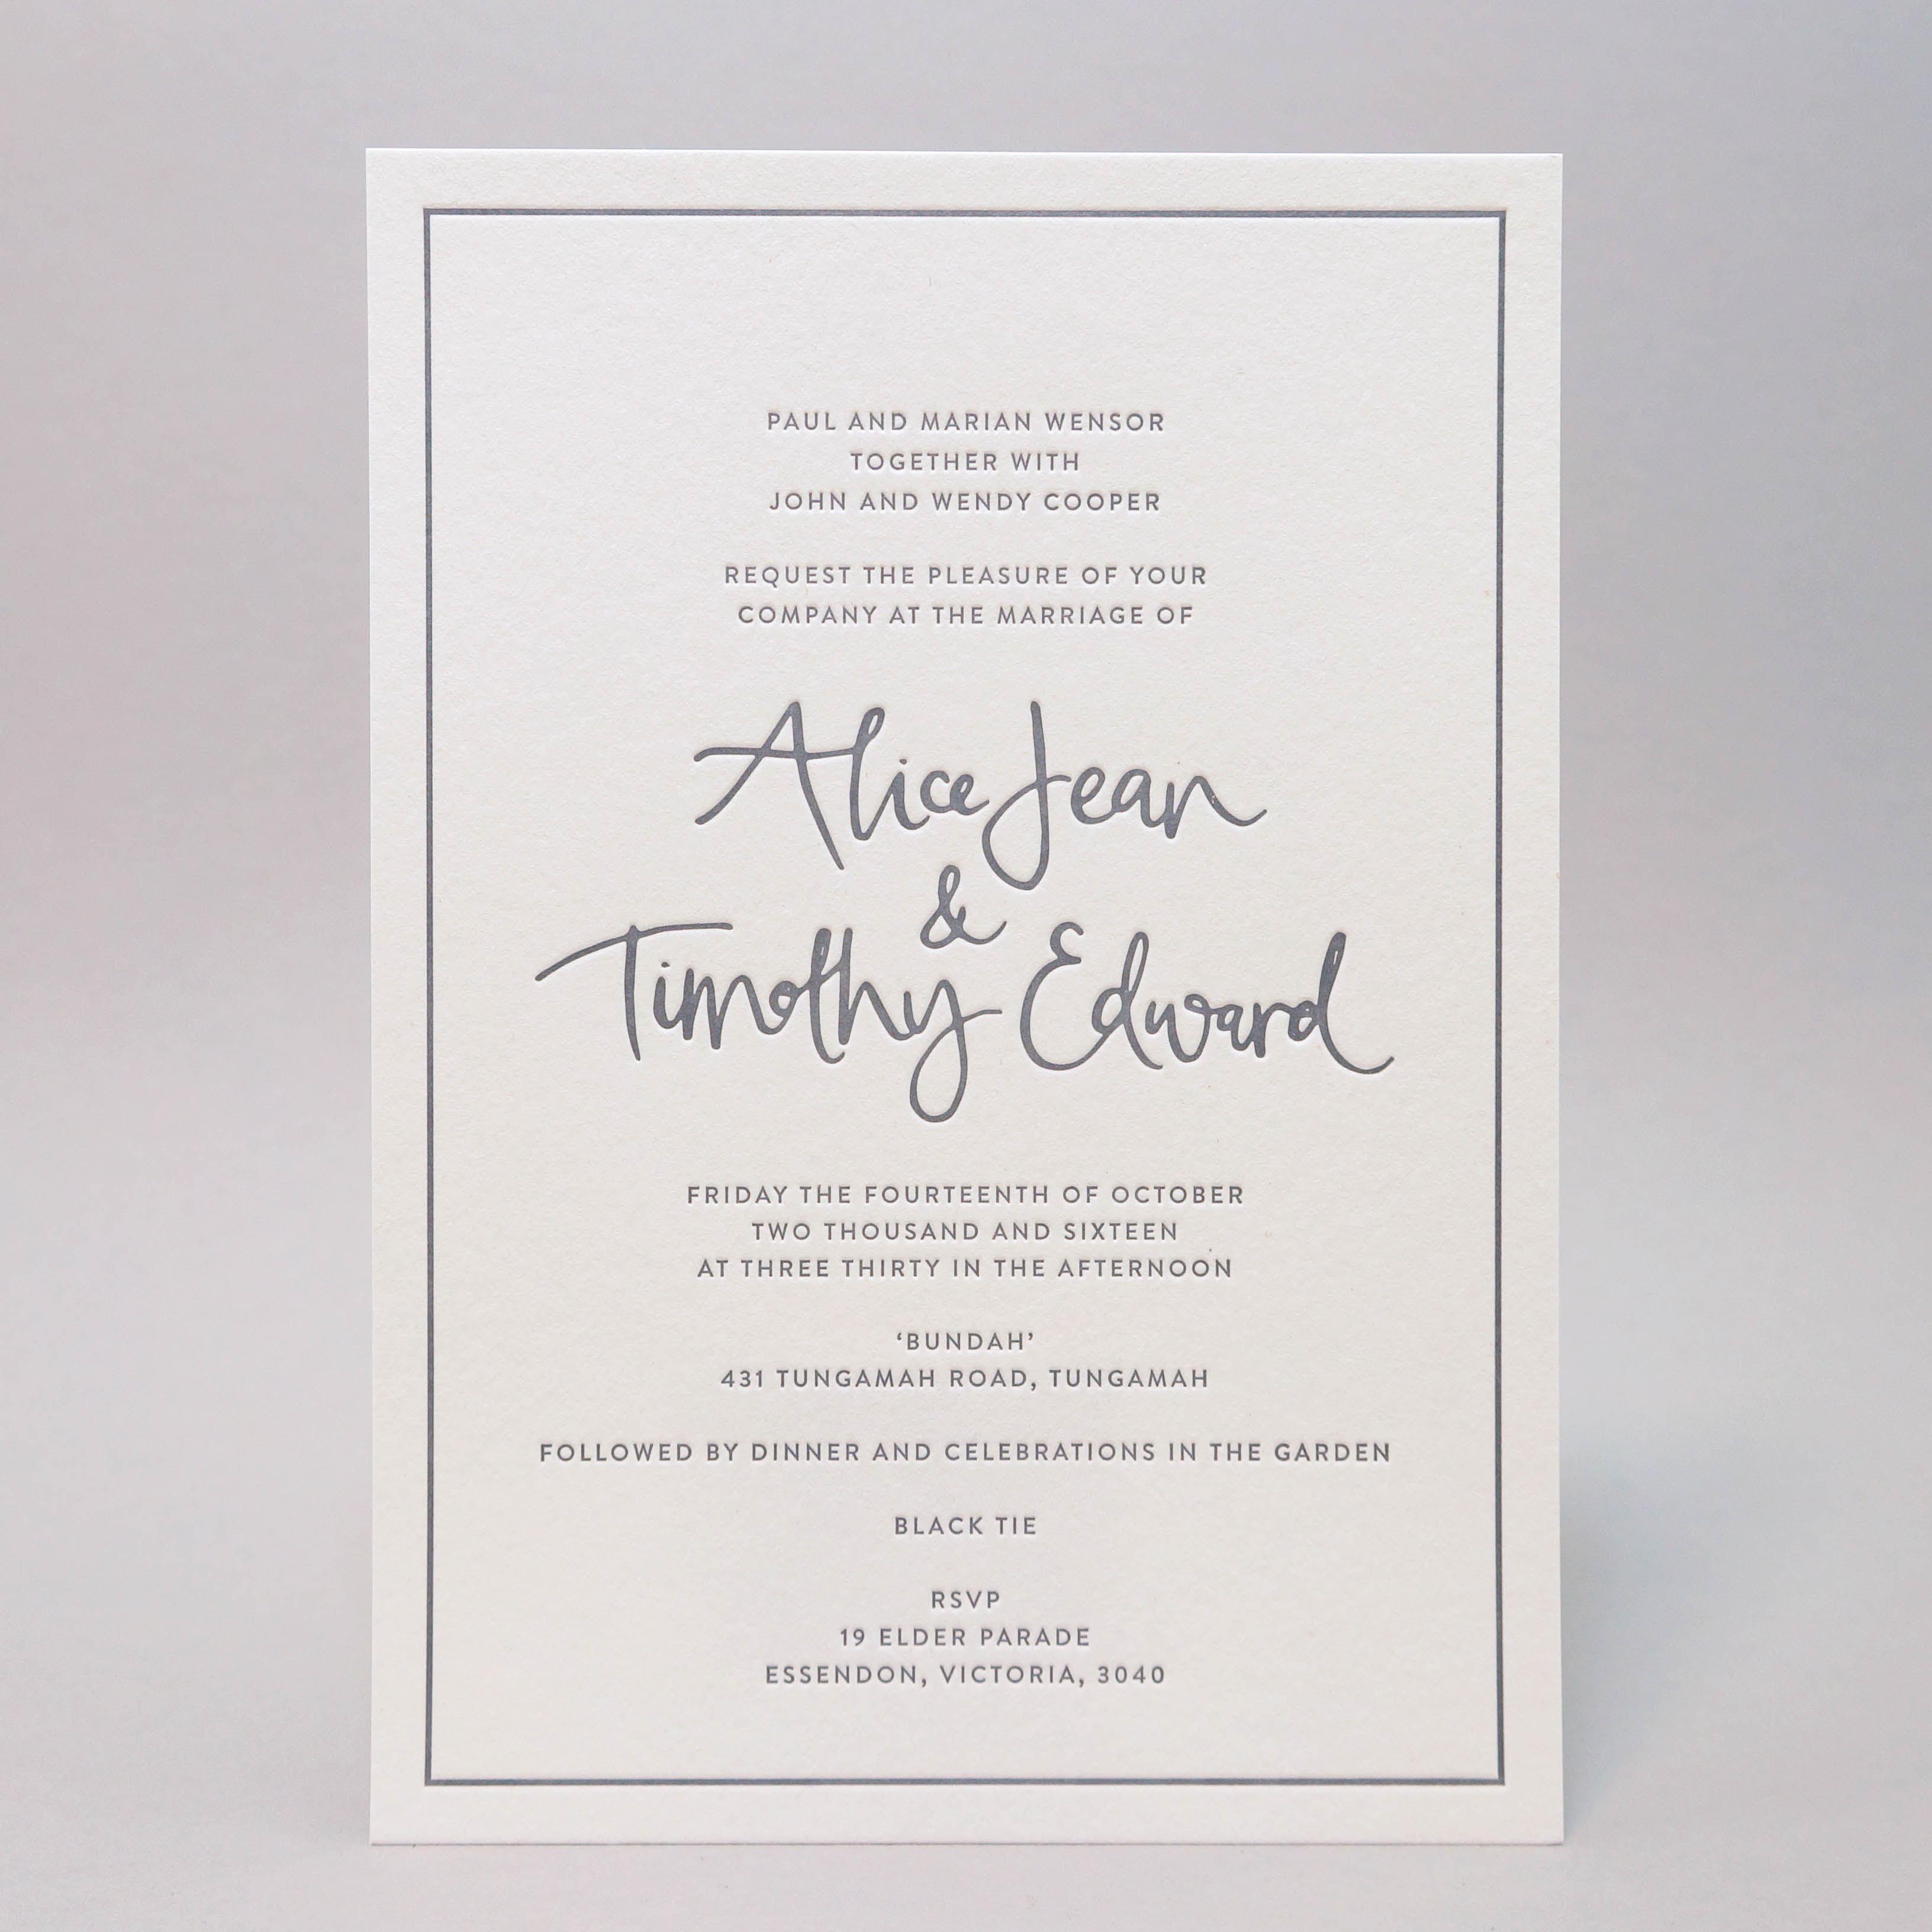 Letterpress-invitations-silver-grey-handwriting